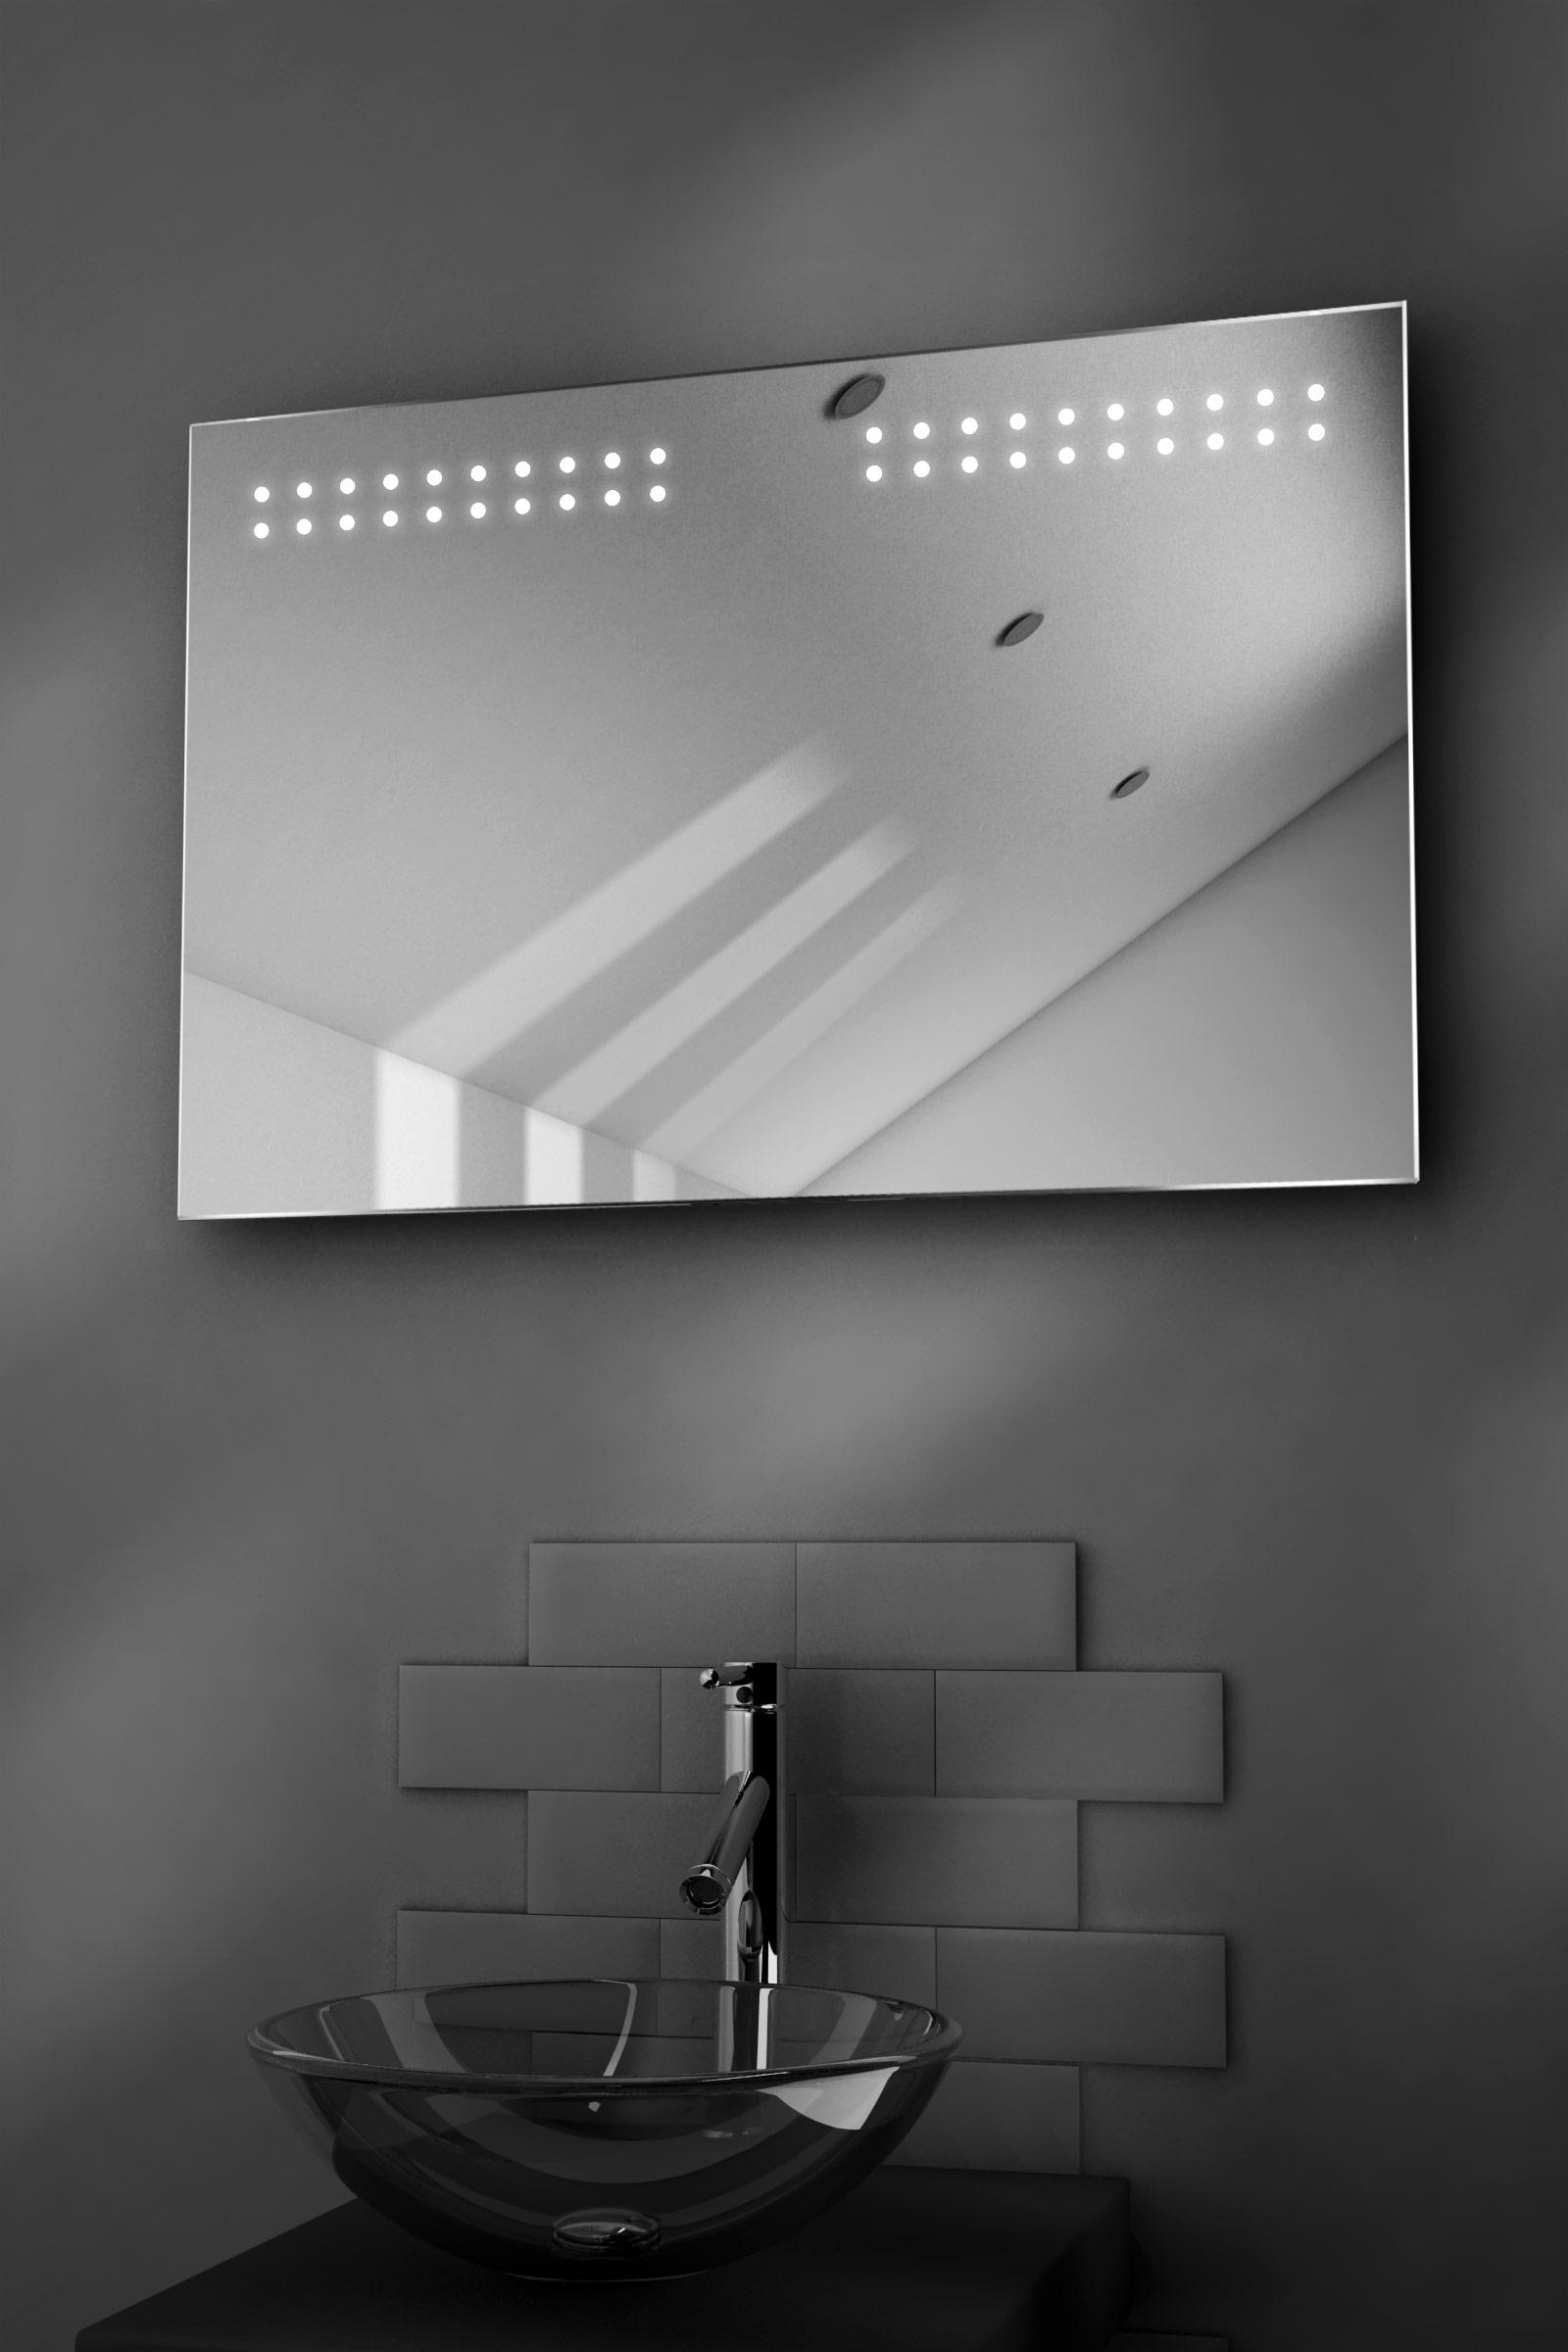 aqua shaver led bathroom illuminated mirror with demister pad sensor